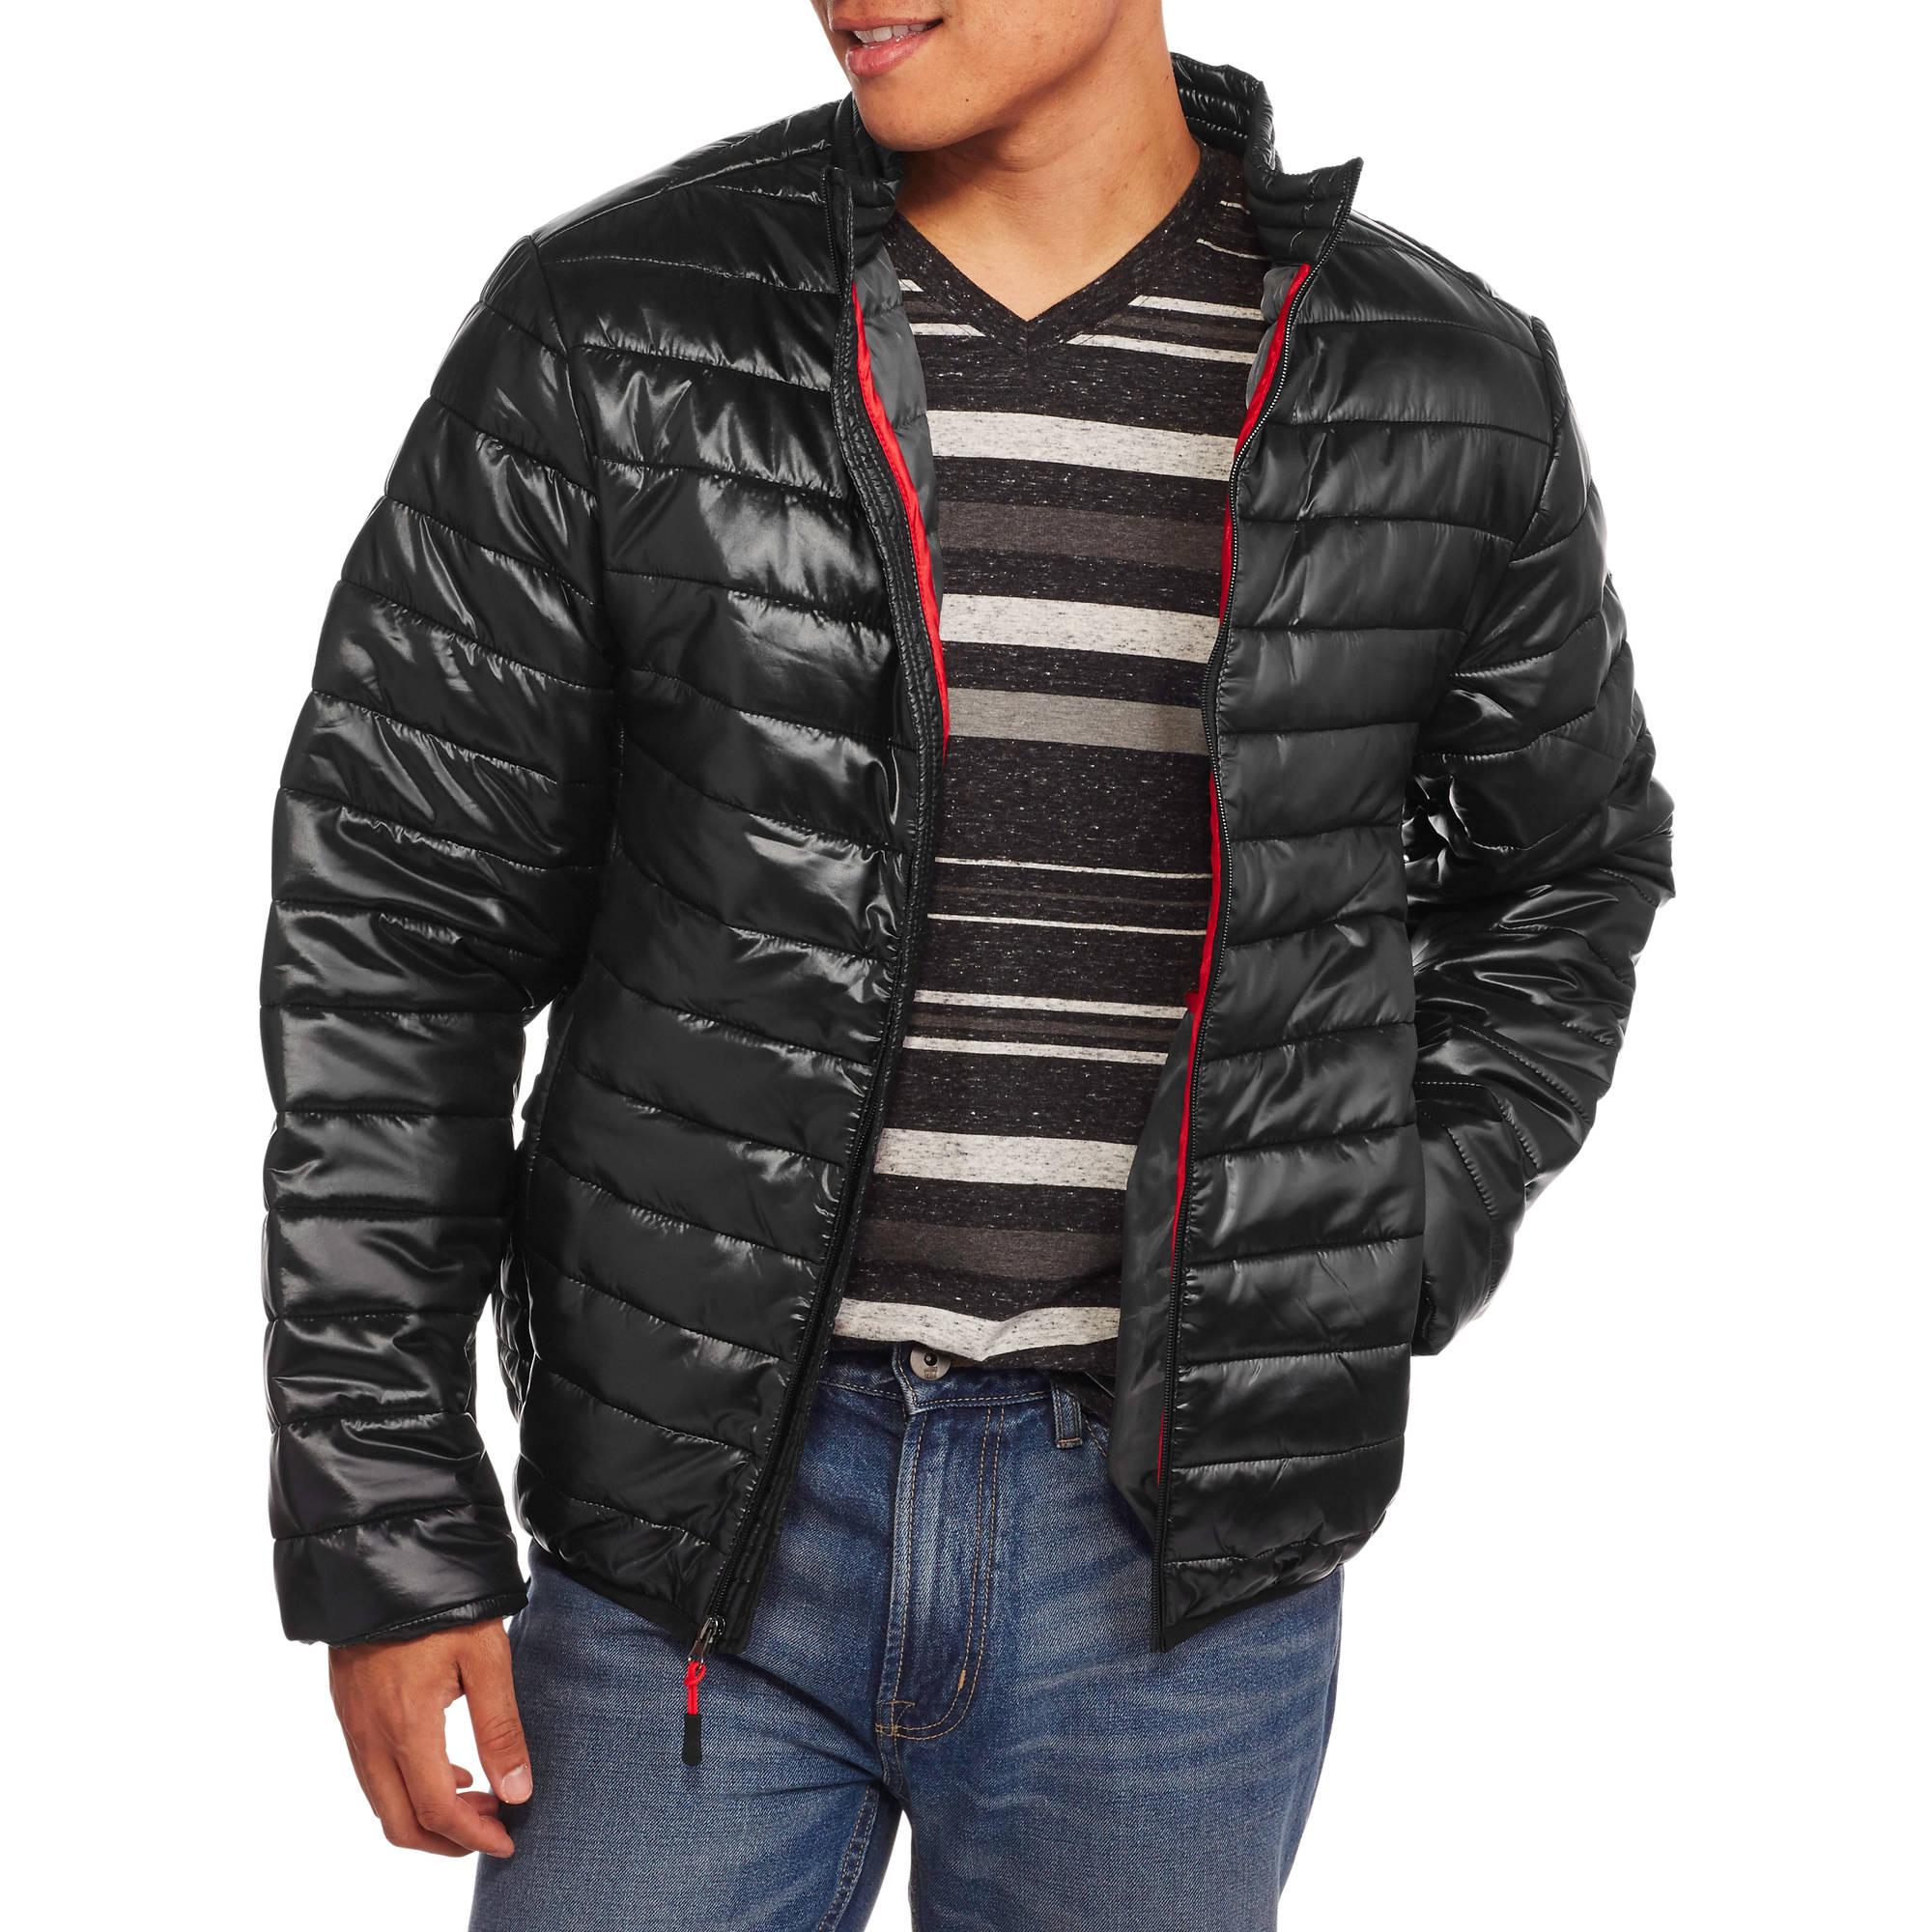 Big Men's Ultra Light Coated Nylon Puffer Jacket